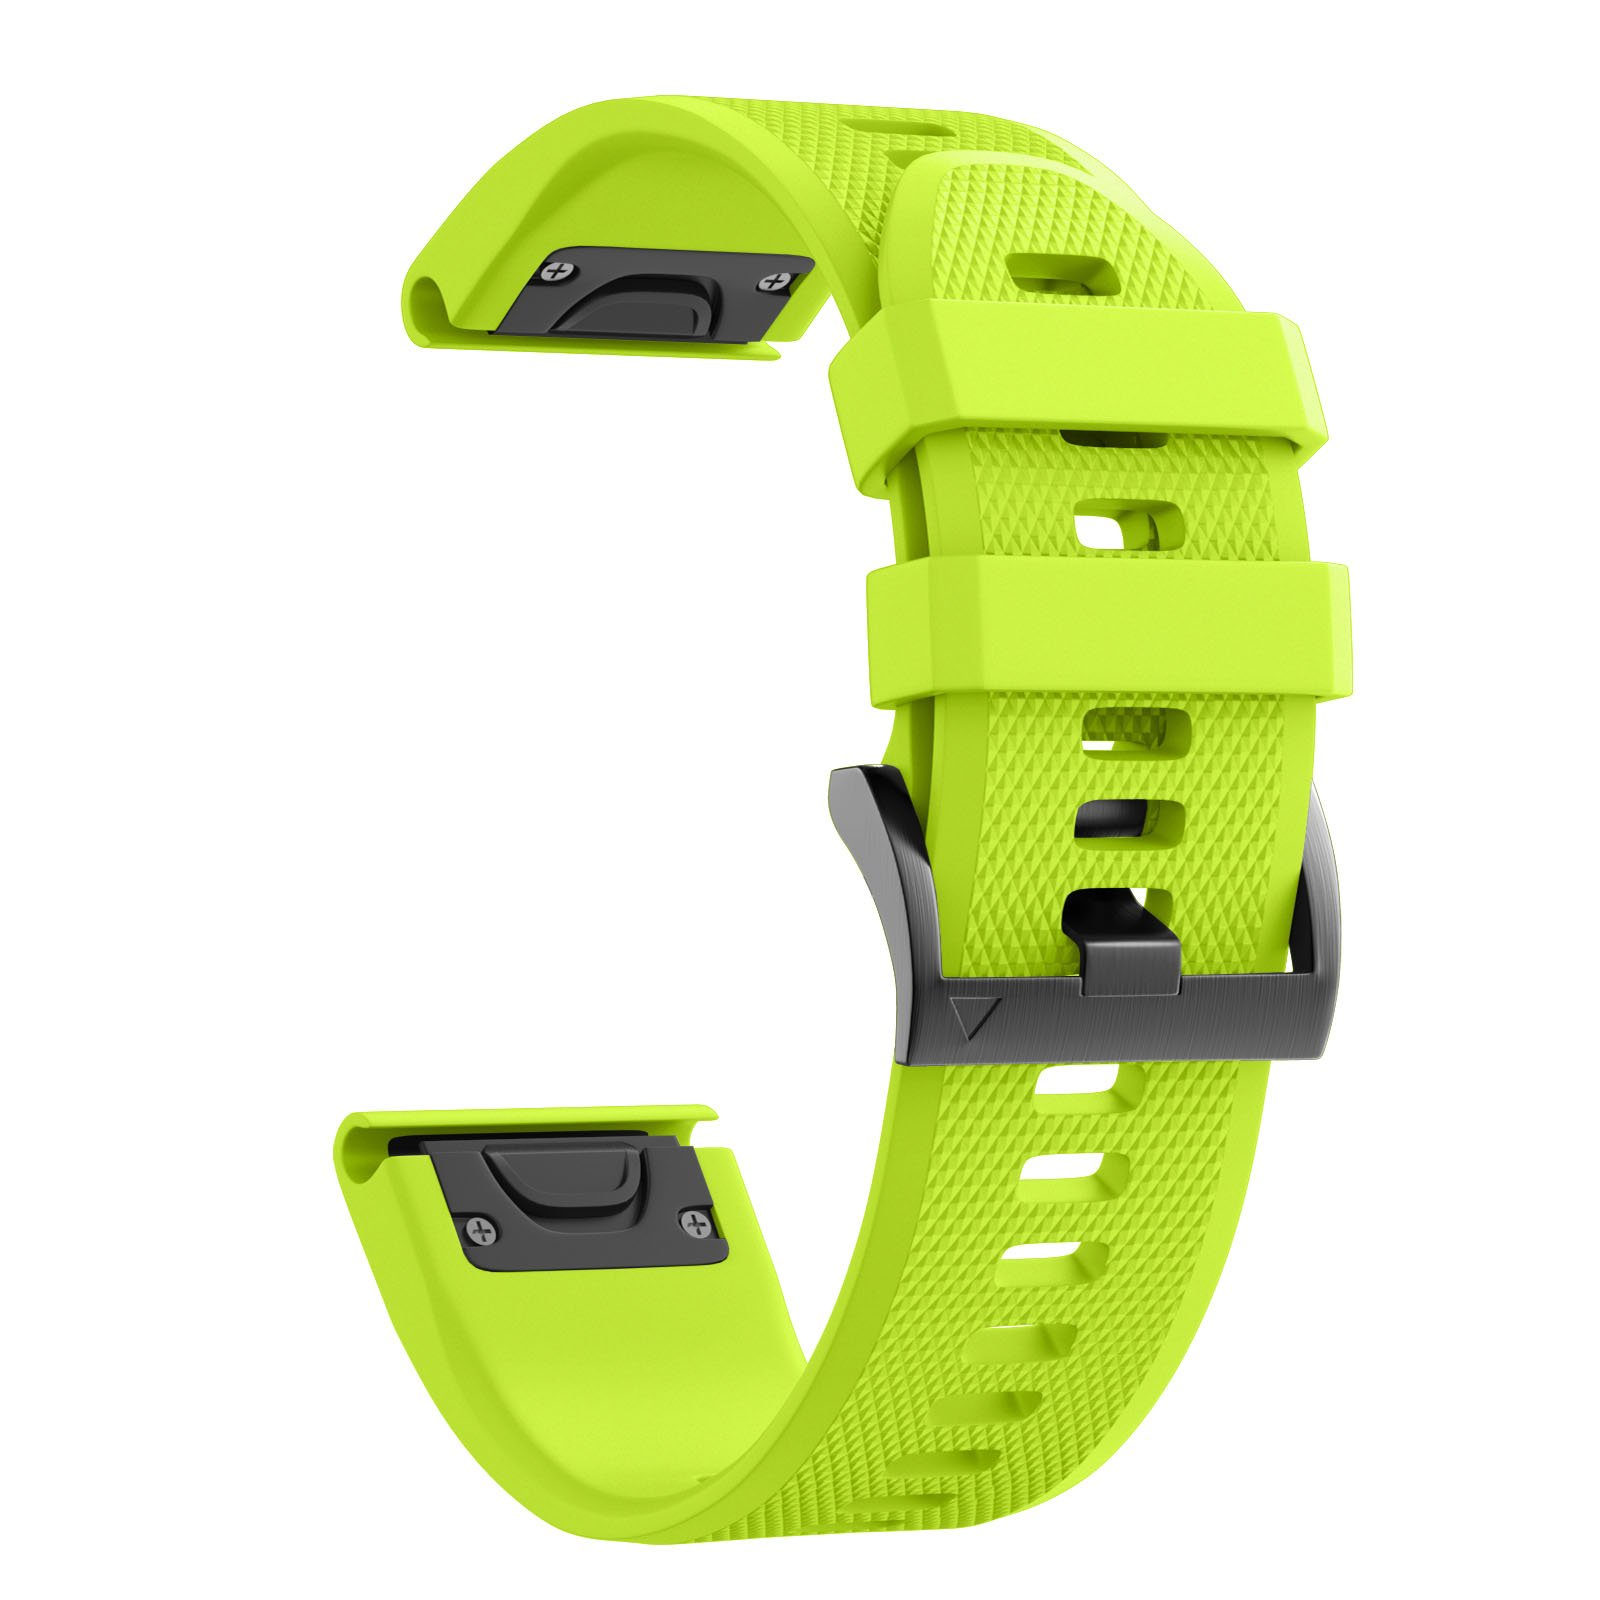 ANCOOL Compatible Garmin Fenix 5 Band Easy Fit 22mm Width Soft Silicone Watch Strap Compatible Garmin Fenix 5/Fenix 5 Plus/Forerunner 935/Approach S60/Quatix 5 - Green